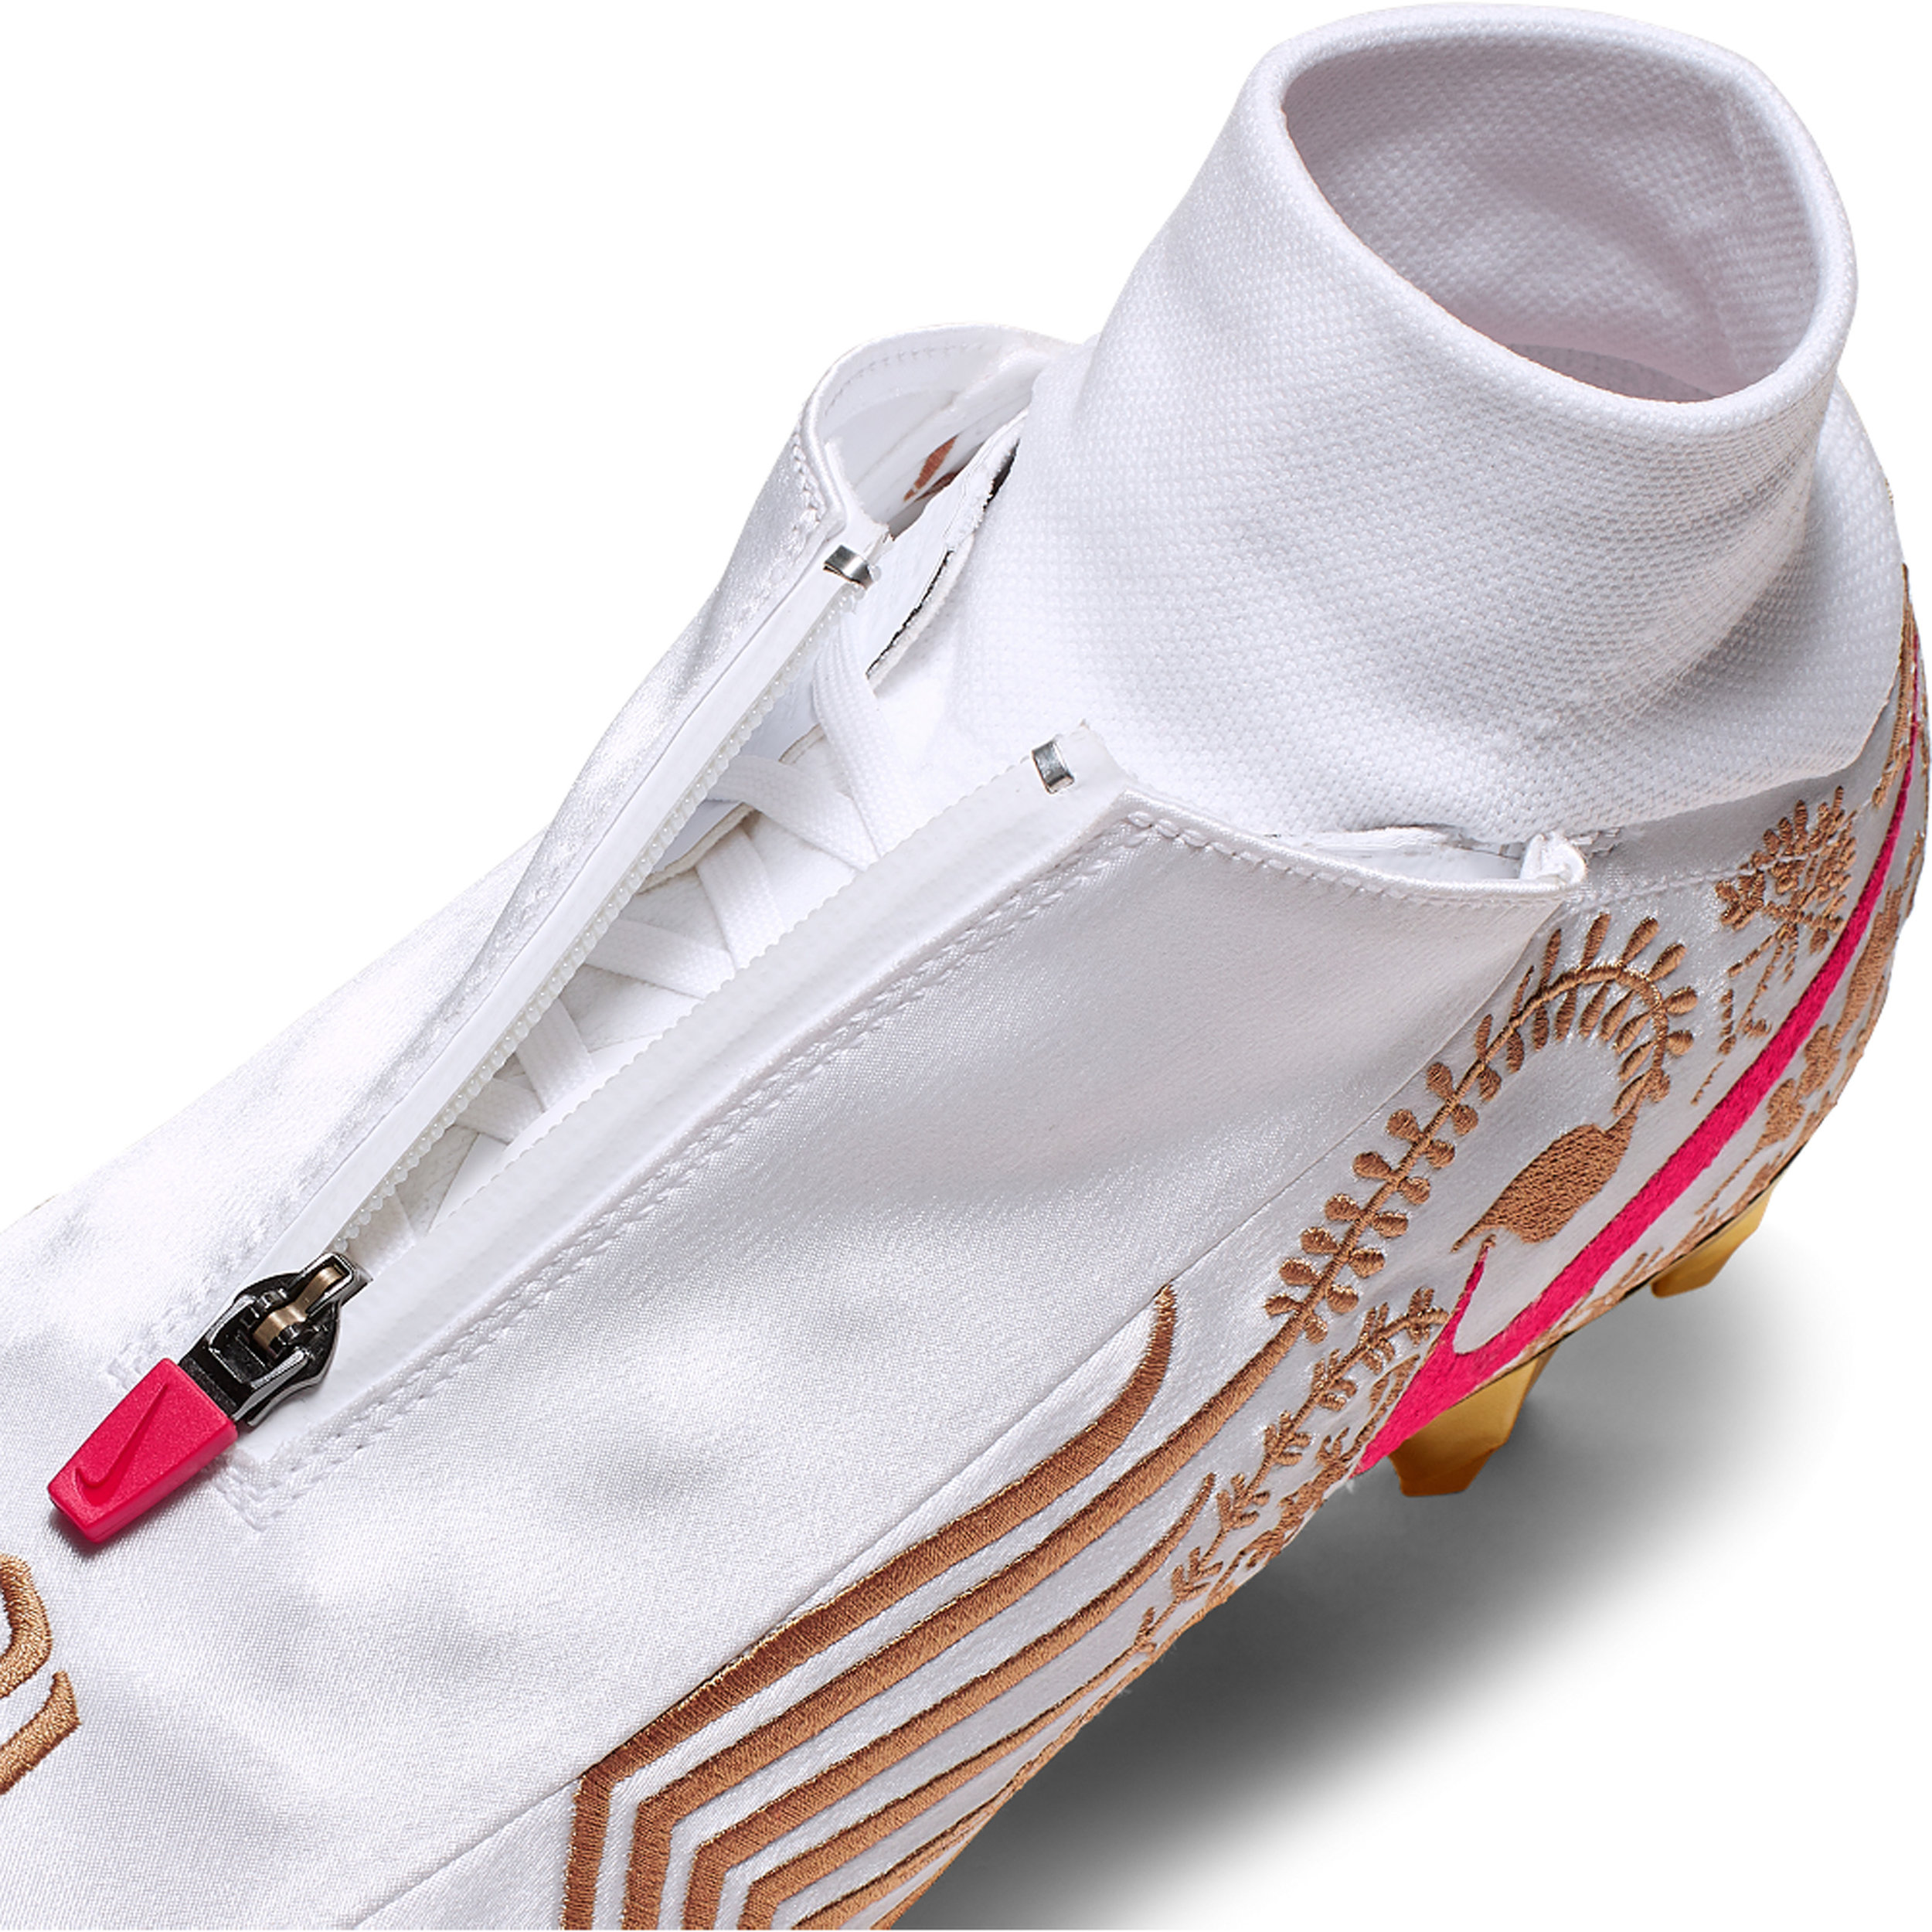 NikeNews_NikeVaporUntouchablePro3_OBJ_10_89290.jpg